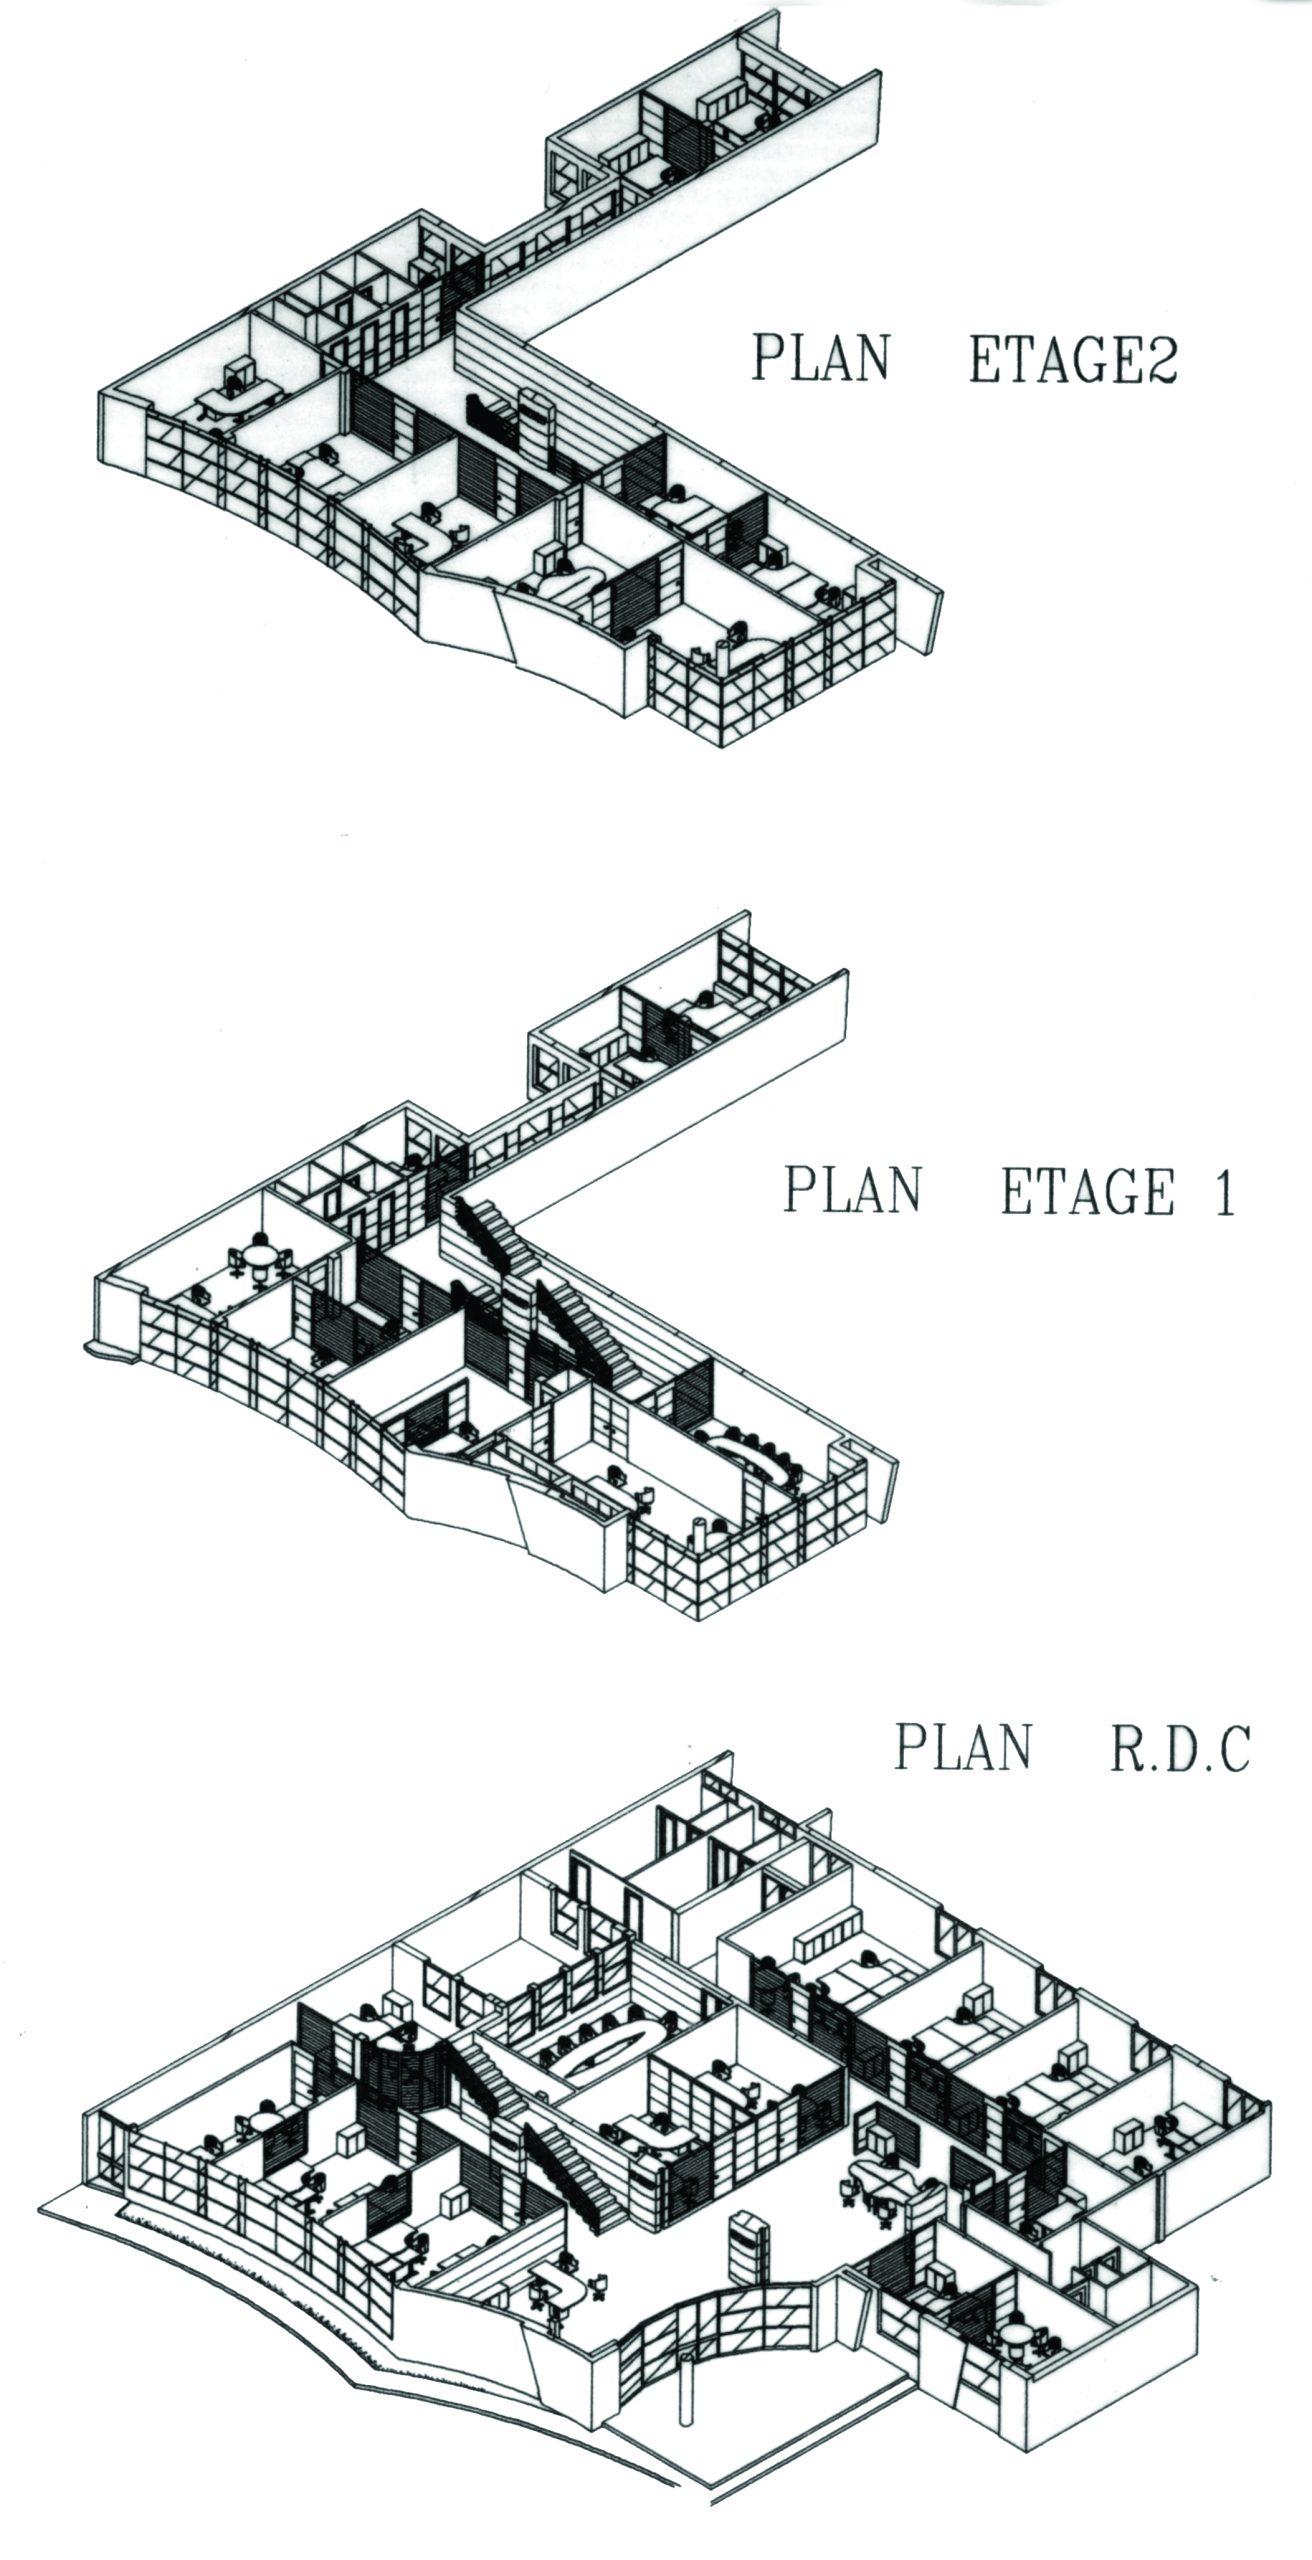 Plan Fiat3